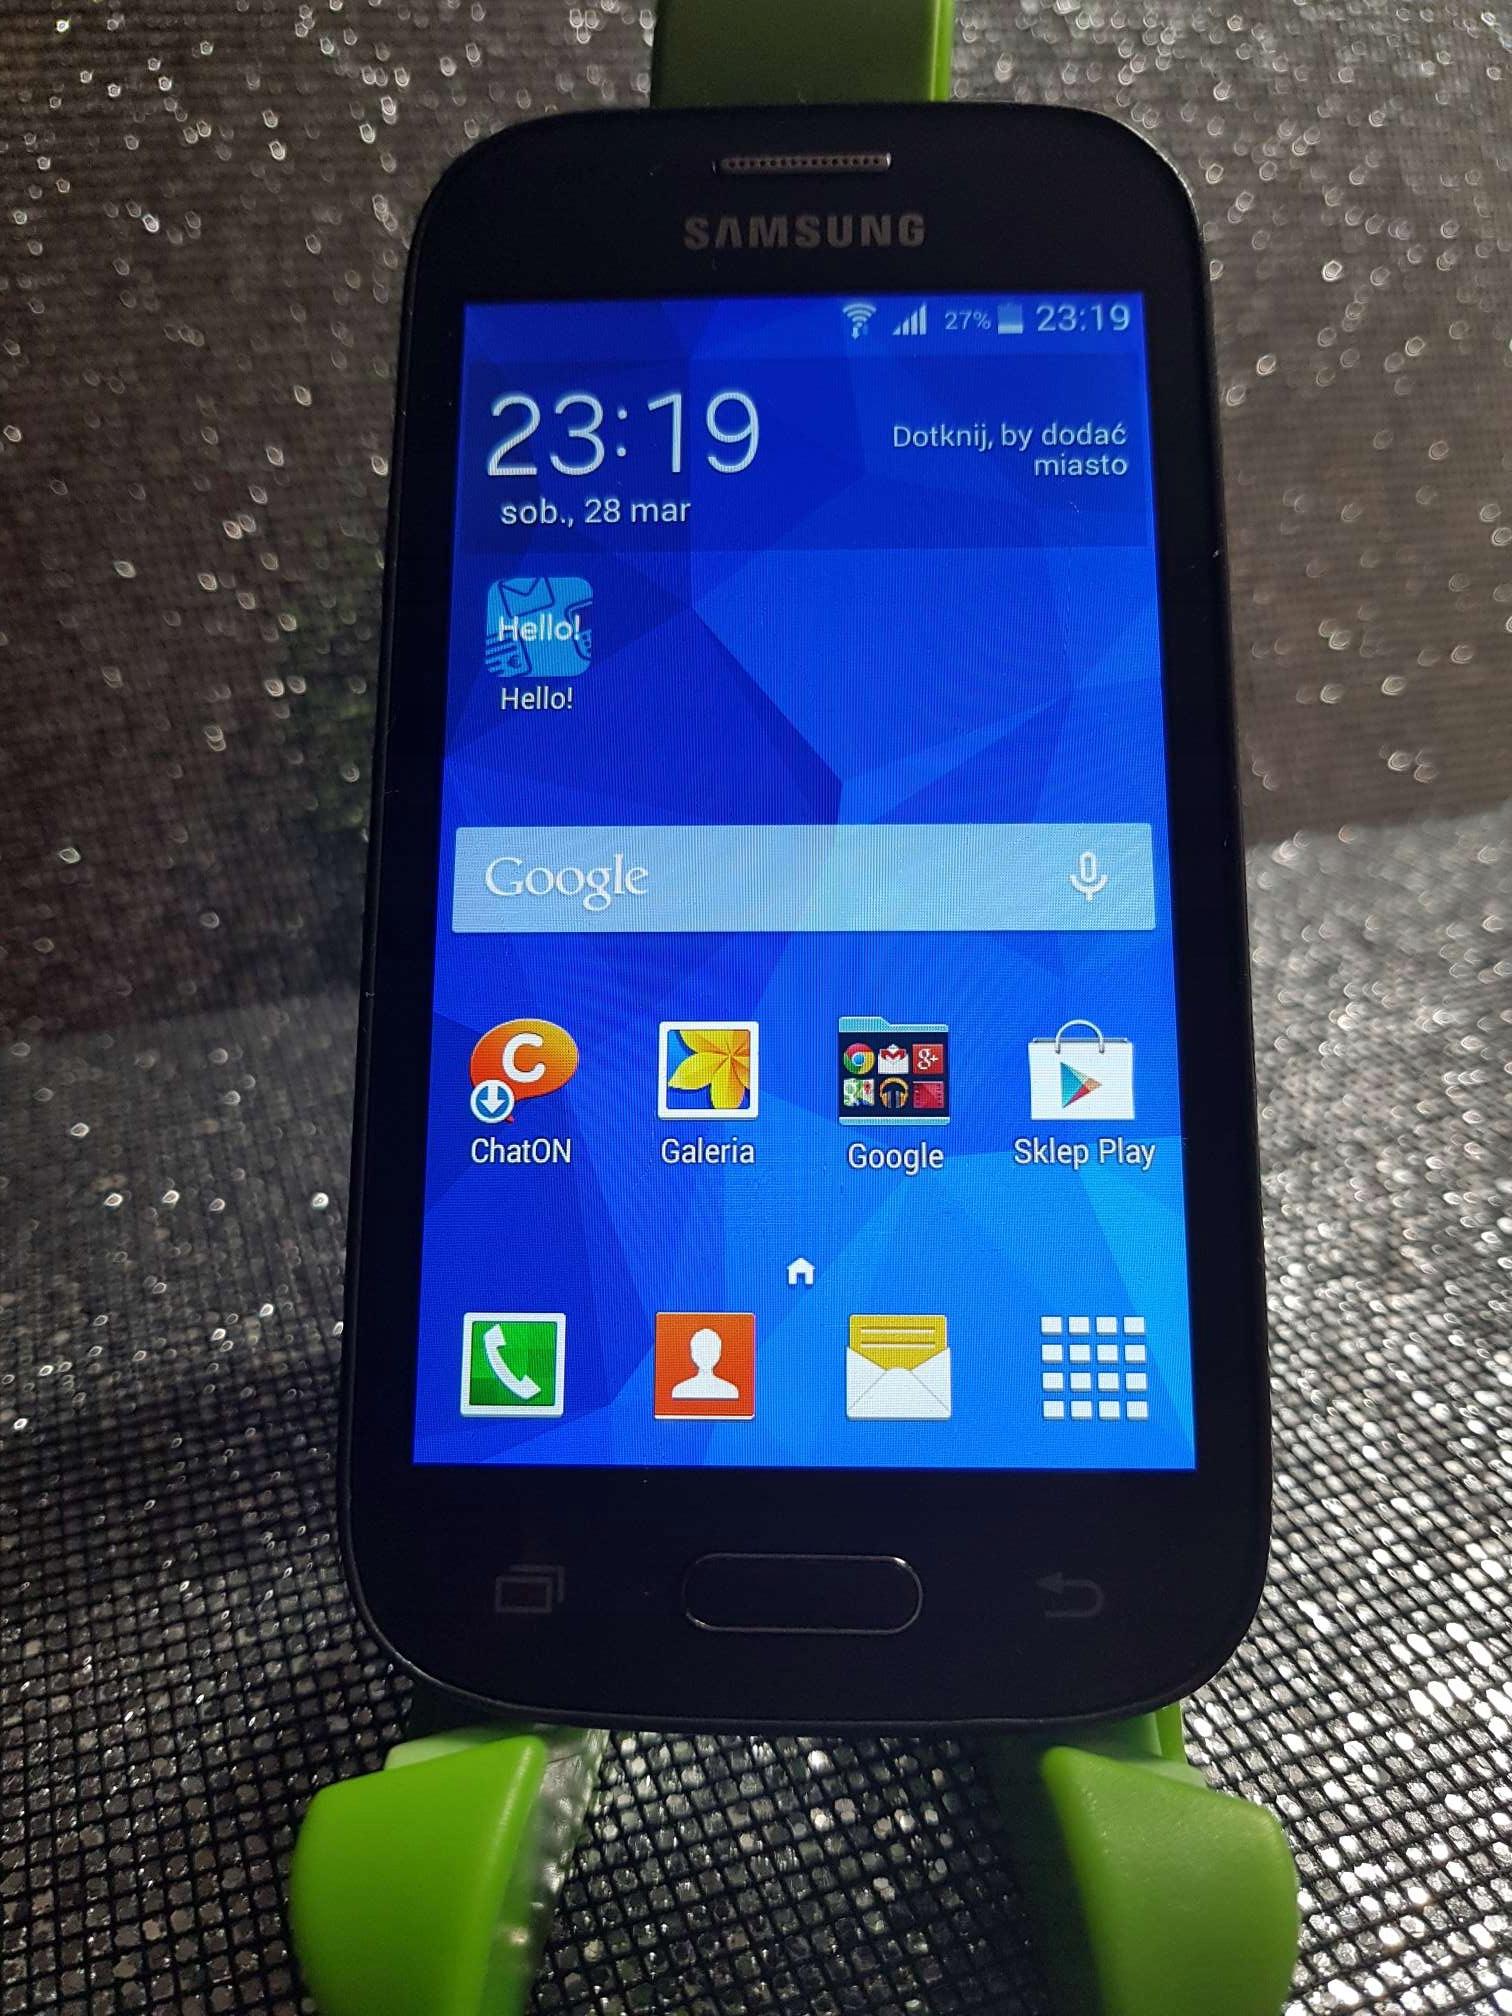 Samsung Galaxy Ace Style Sm G310hn 9110825984 Sklep Internetowy Agd Rtv Telefony Laptopy Allegro Pl